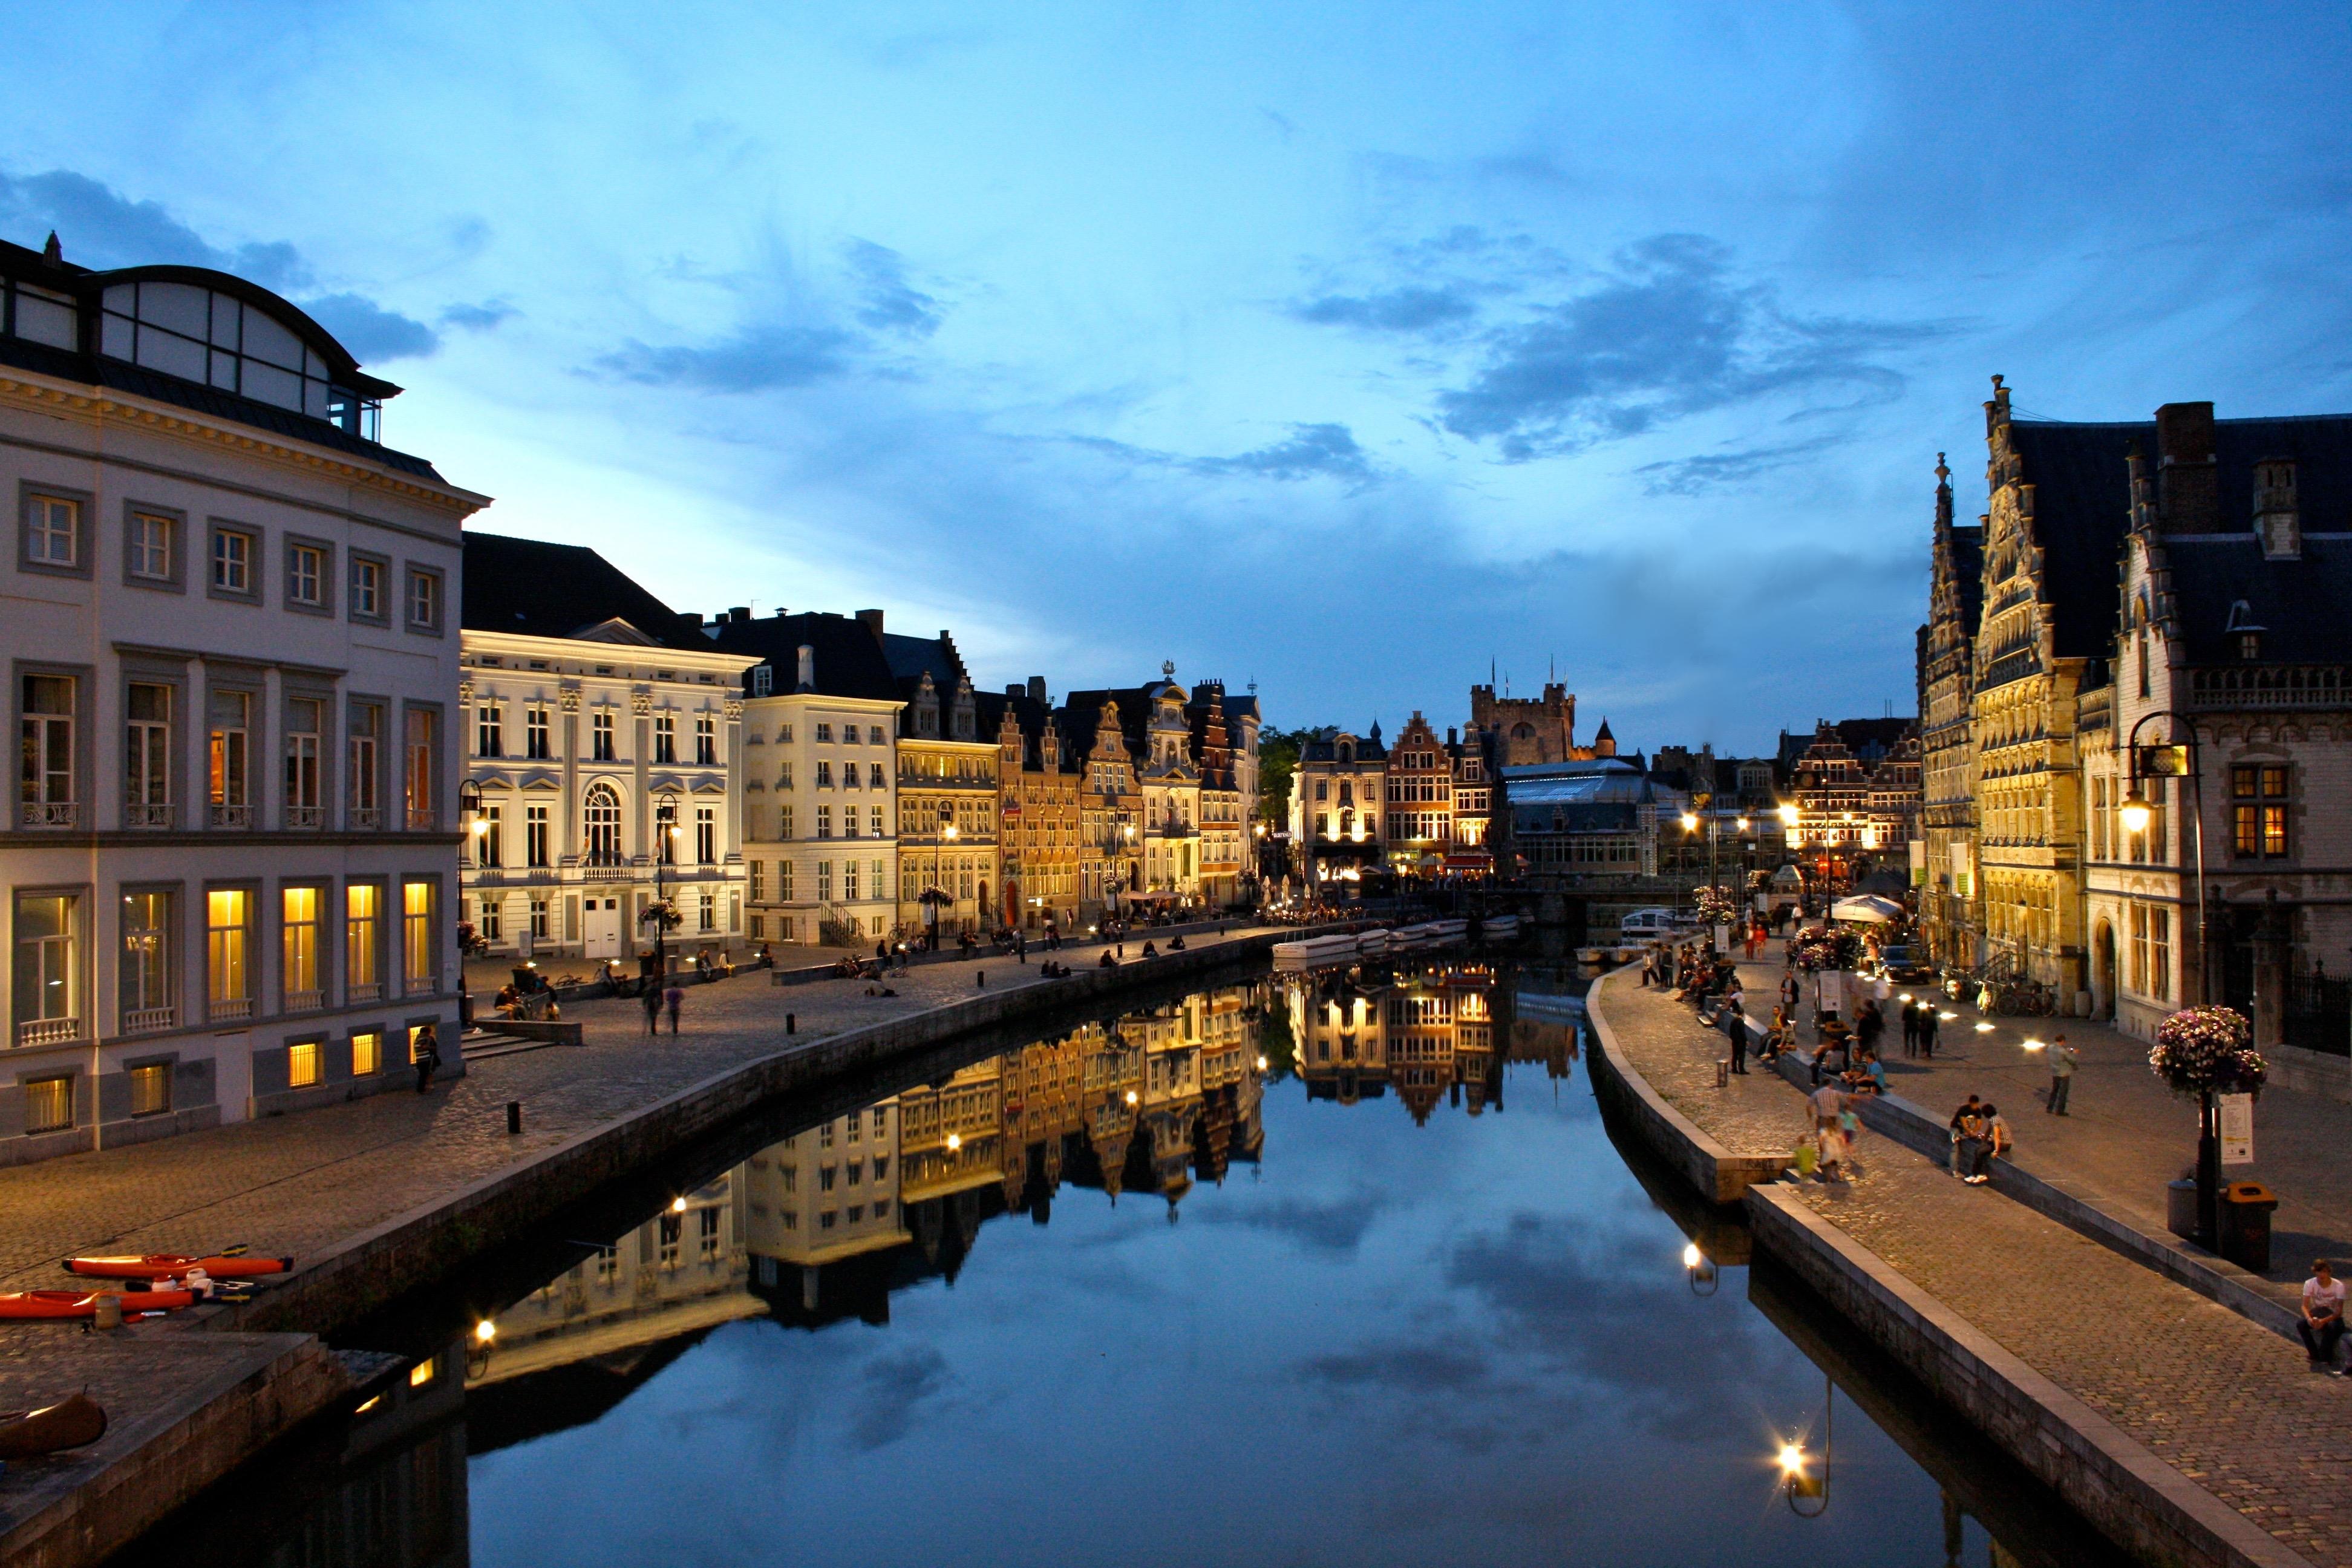 File:Gent Graslei zonsondergang.JPG - Wikimedia Commons